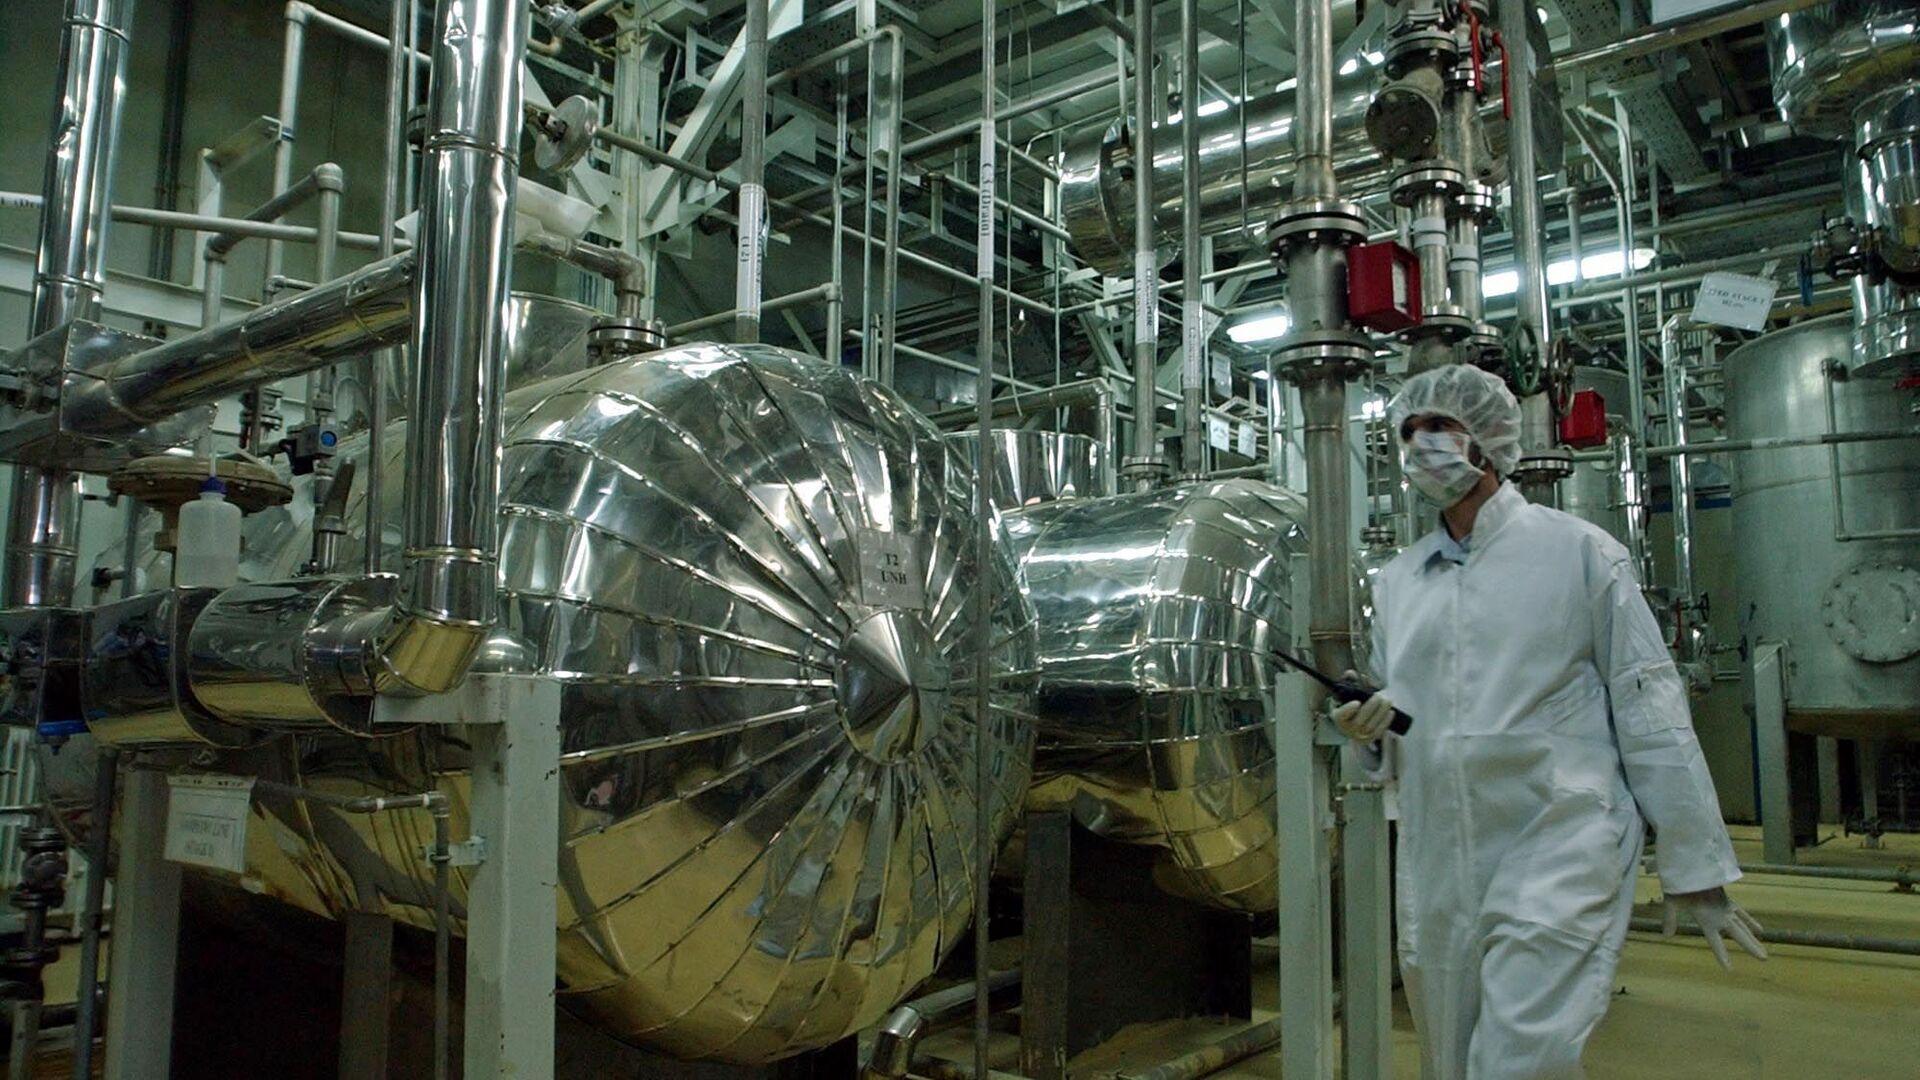 Un impianto nucleare in Iran - Sputnik Italia, 1920, 02.02.2021